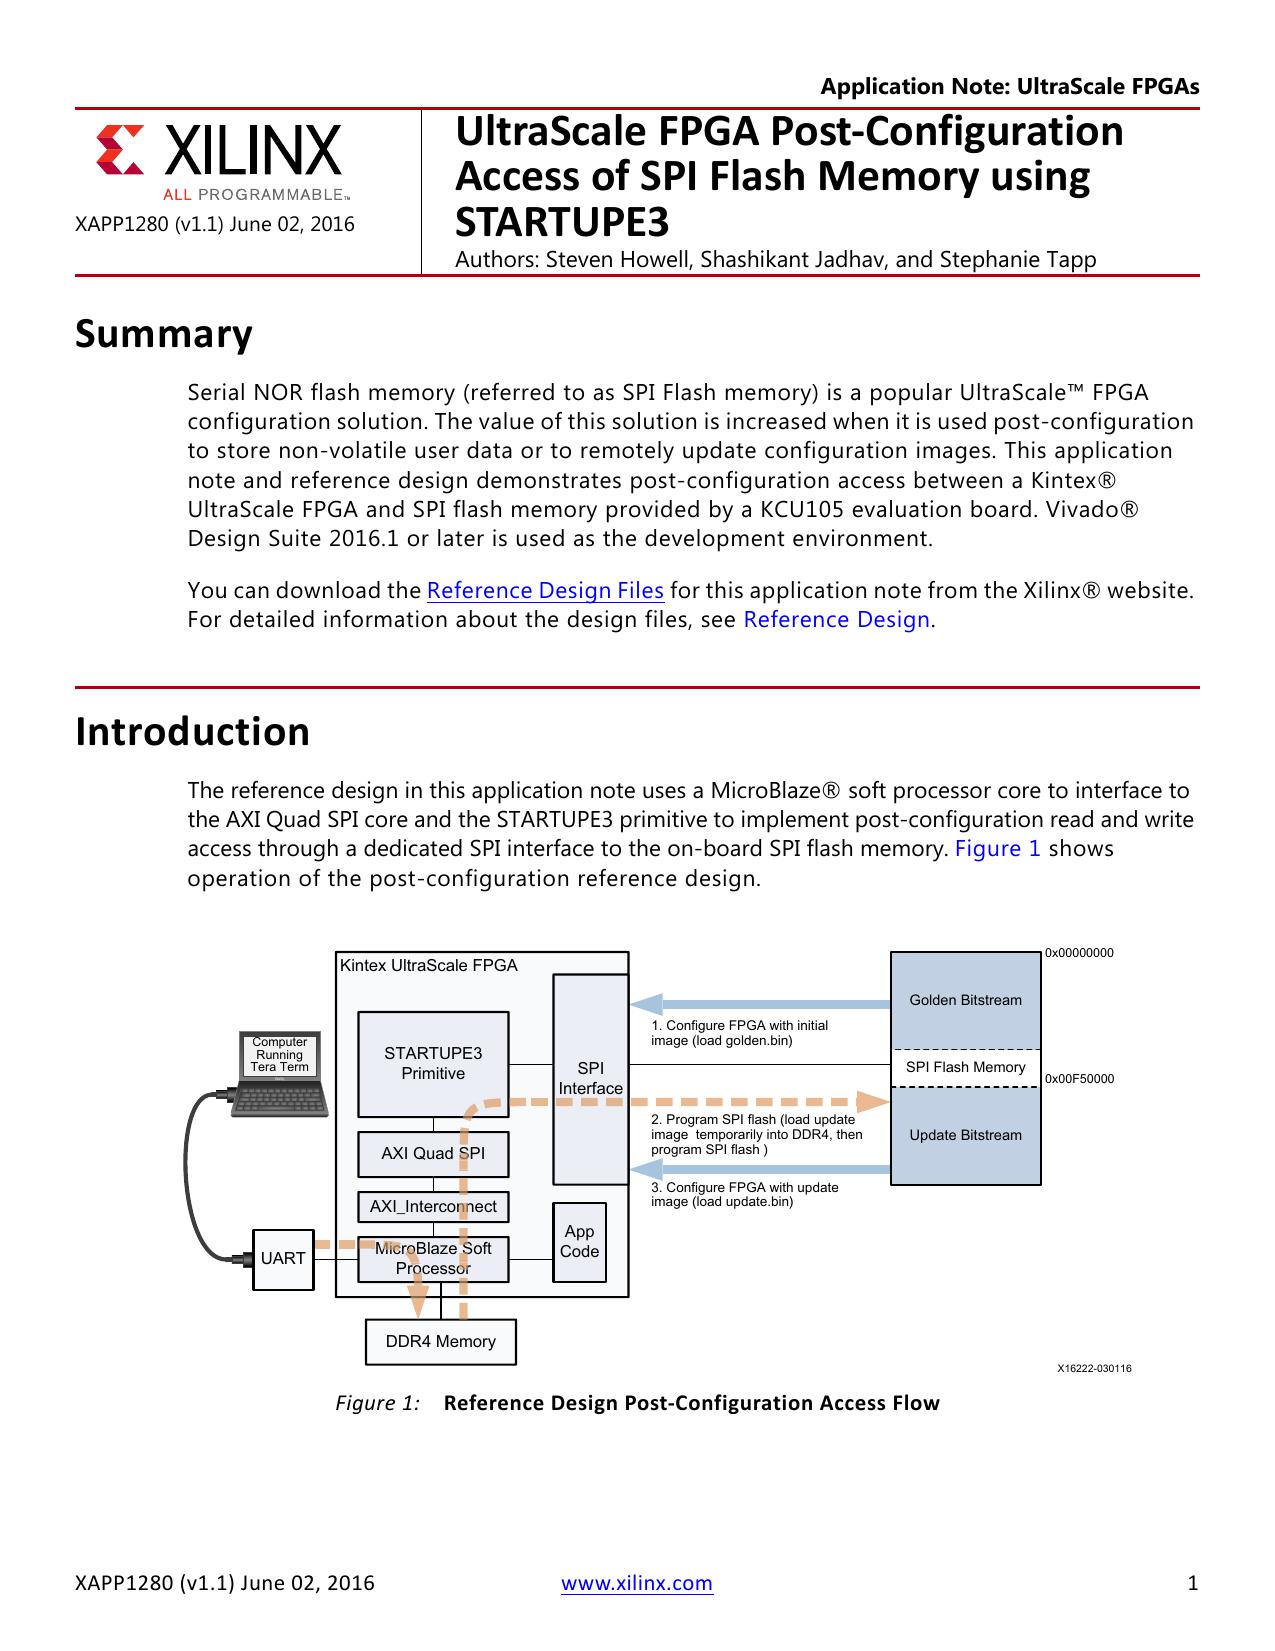 UltraScale FPGA Post-Configuration Access of SPI Flash